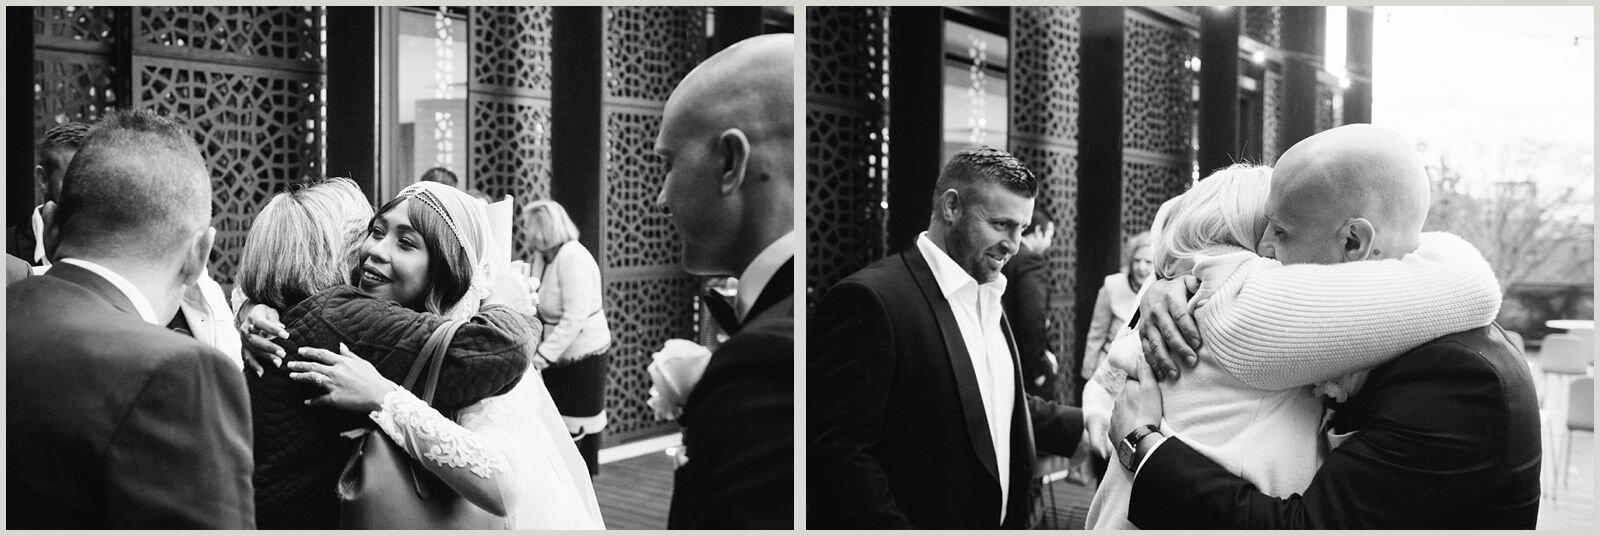 joseph_koprek_wedding_melbourne_the_prince_deck_0068.jpg